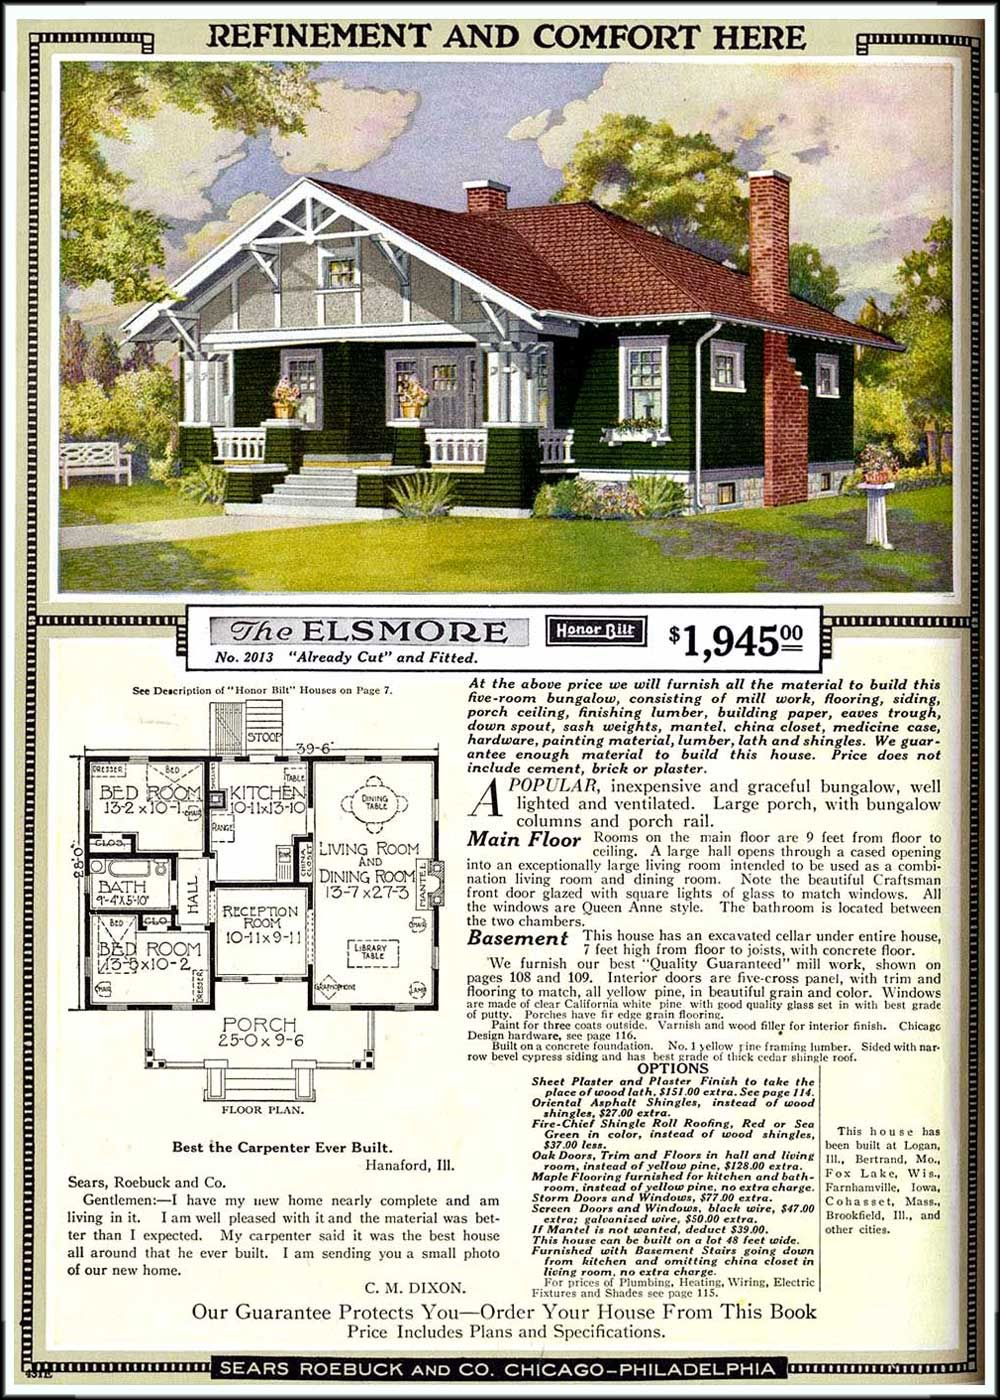 Sears Roebuck Catalog Home 2013 The Elsmore 1921 Craftsman House Sears Catalog Homes Vintage House Plans